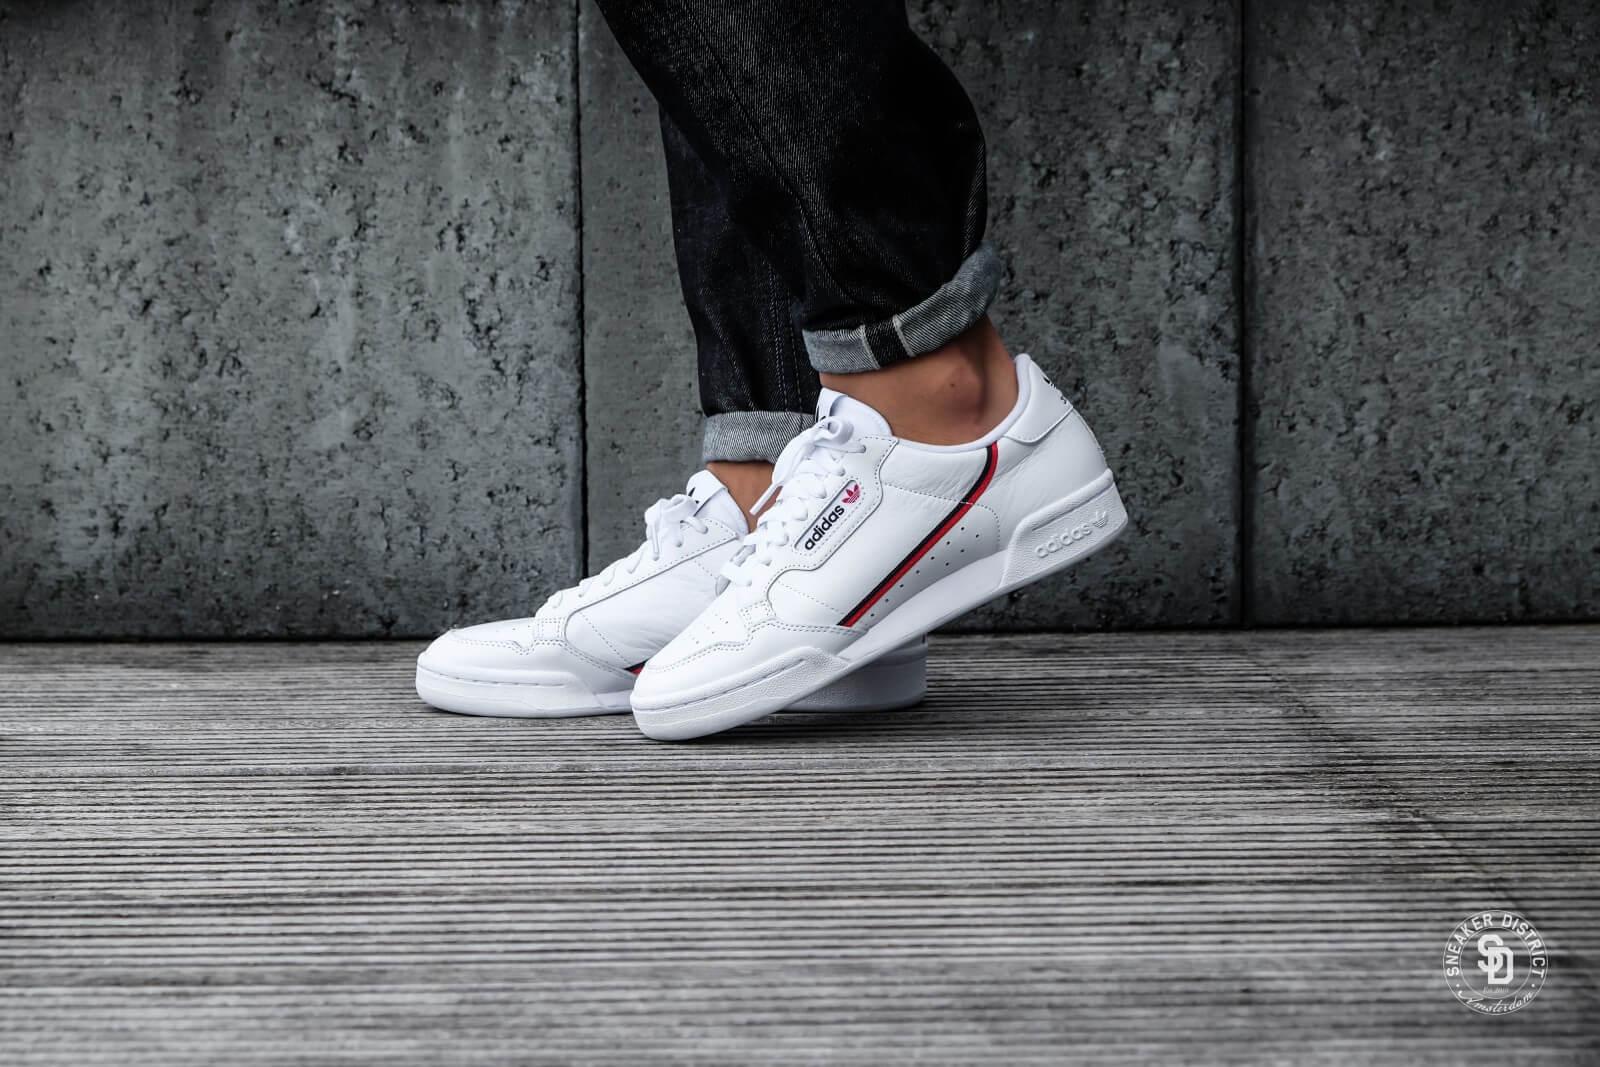 Adidas Continental 80 Footwear White/Scarlet/Navy - B41674